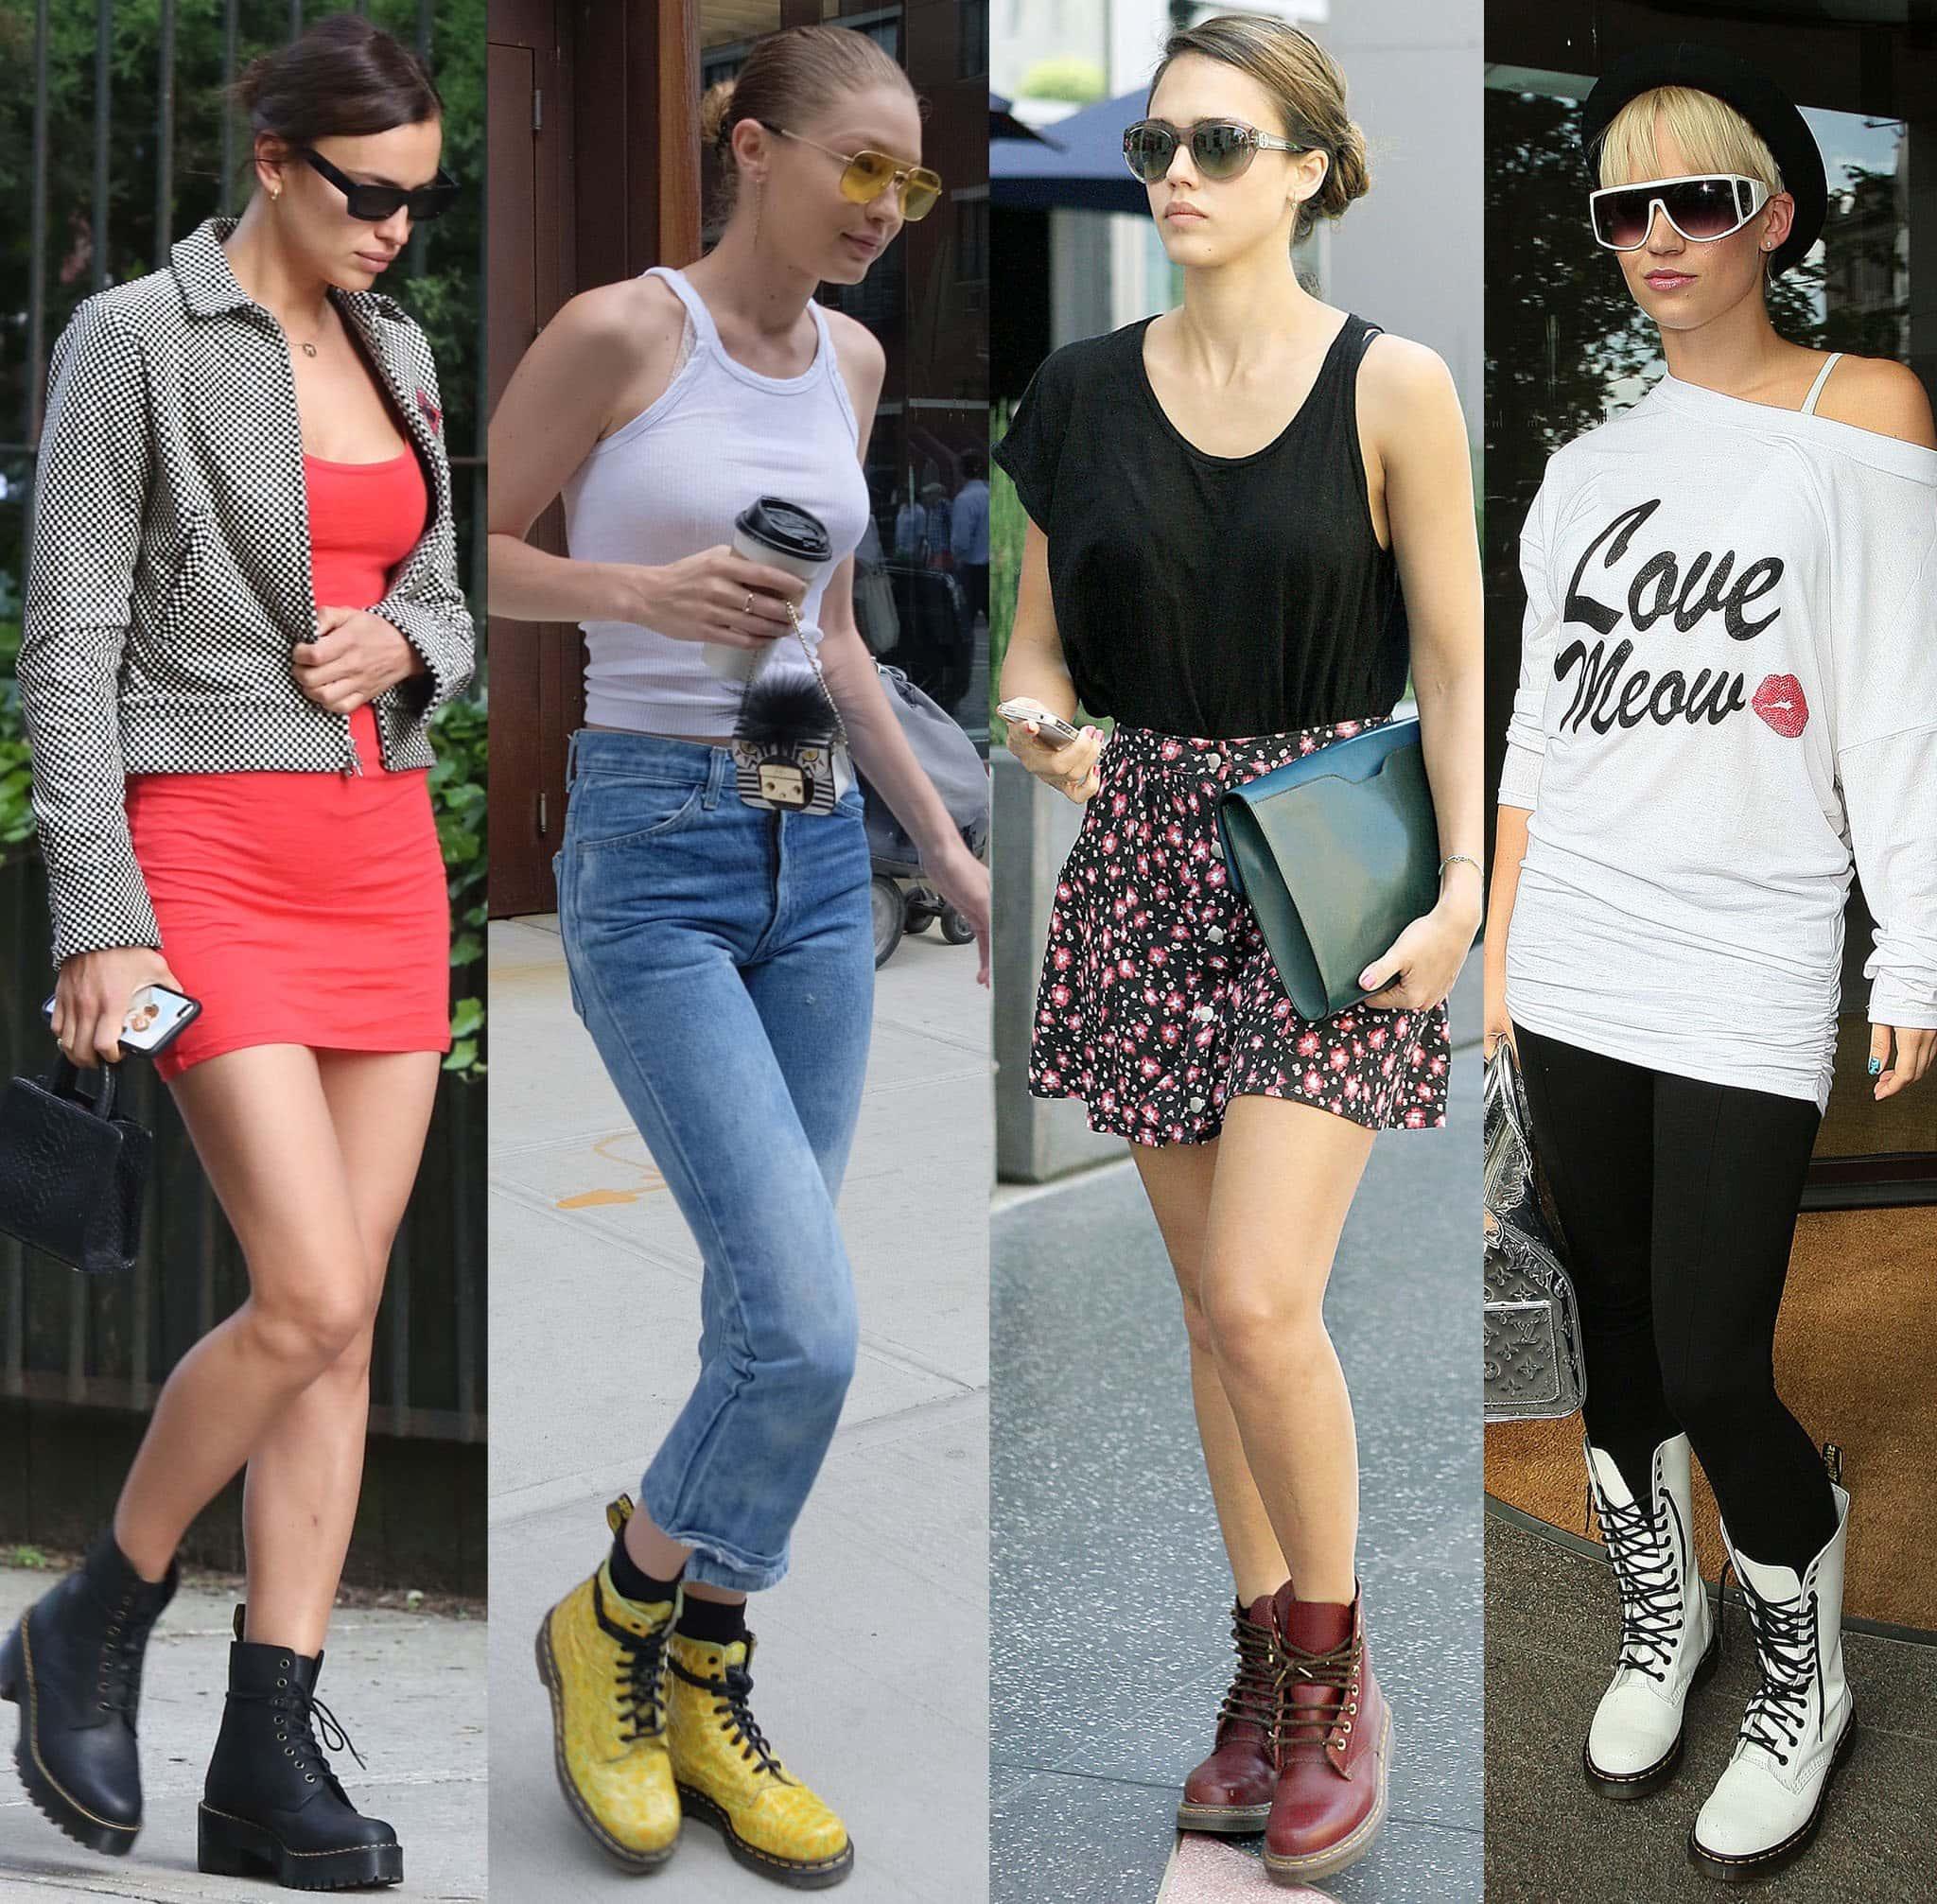 Irina Shayk, Gigi Hadid, Jessica Alba, and Kimberly Wyatt show different ways to wear Dr. Martens' combat boots